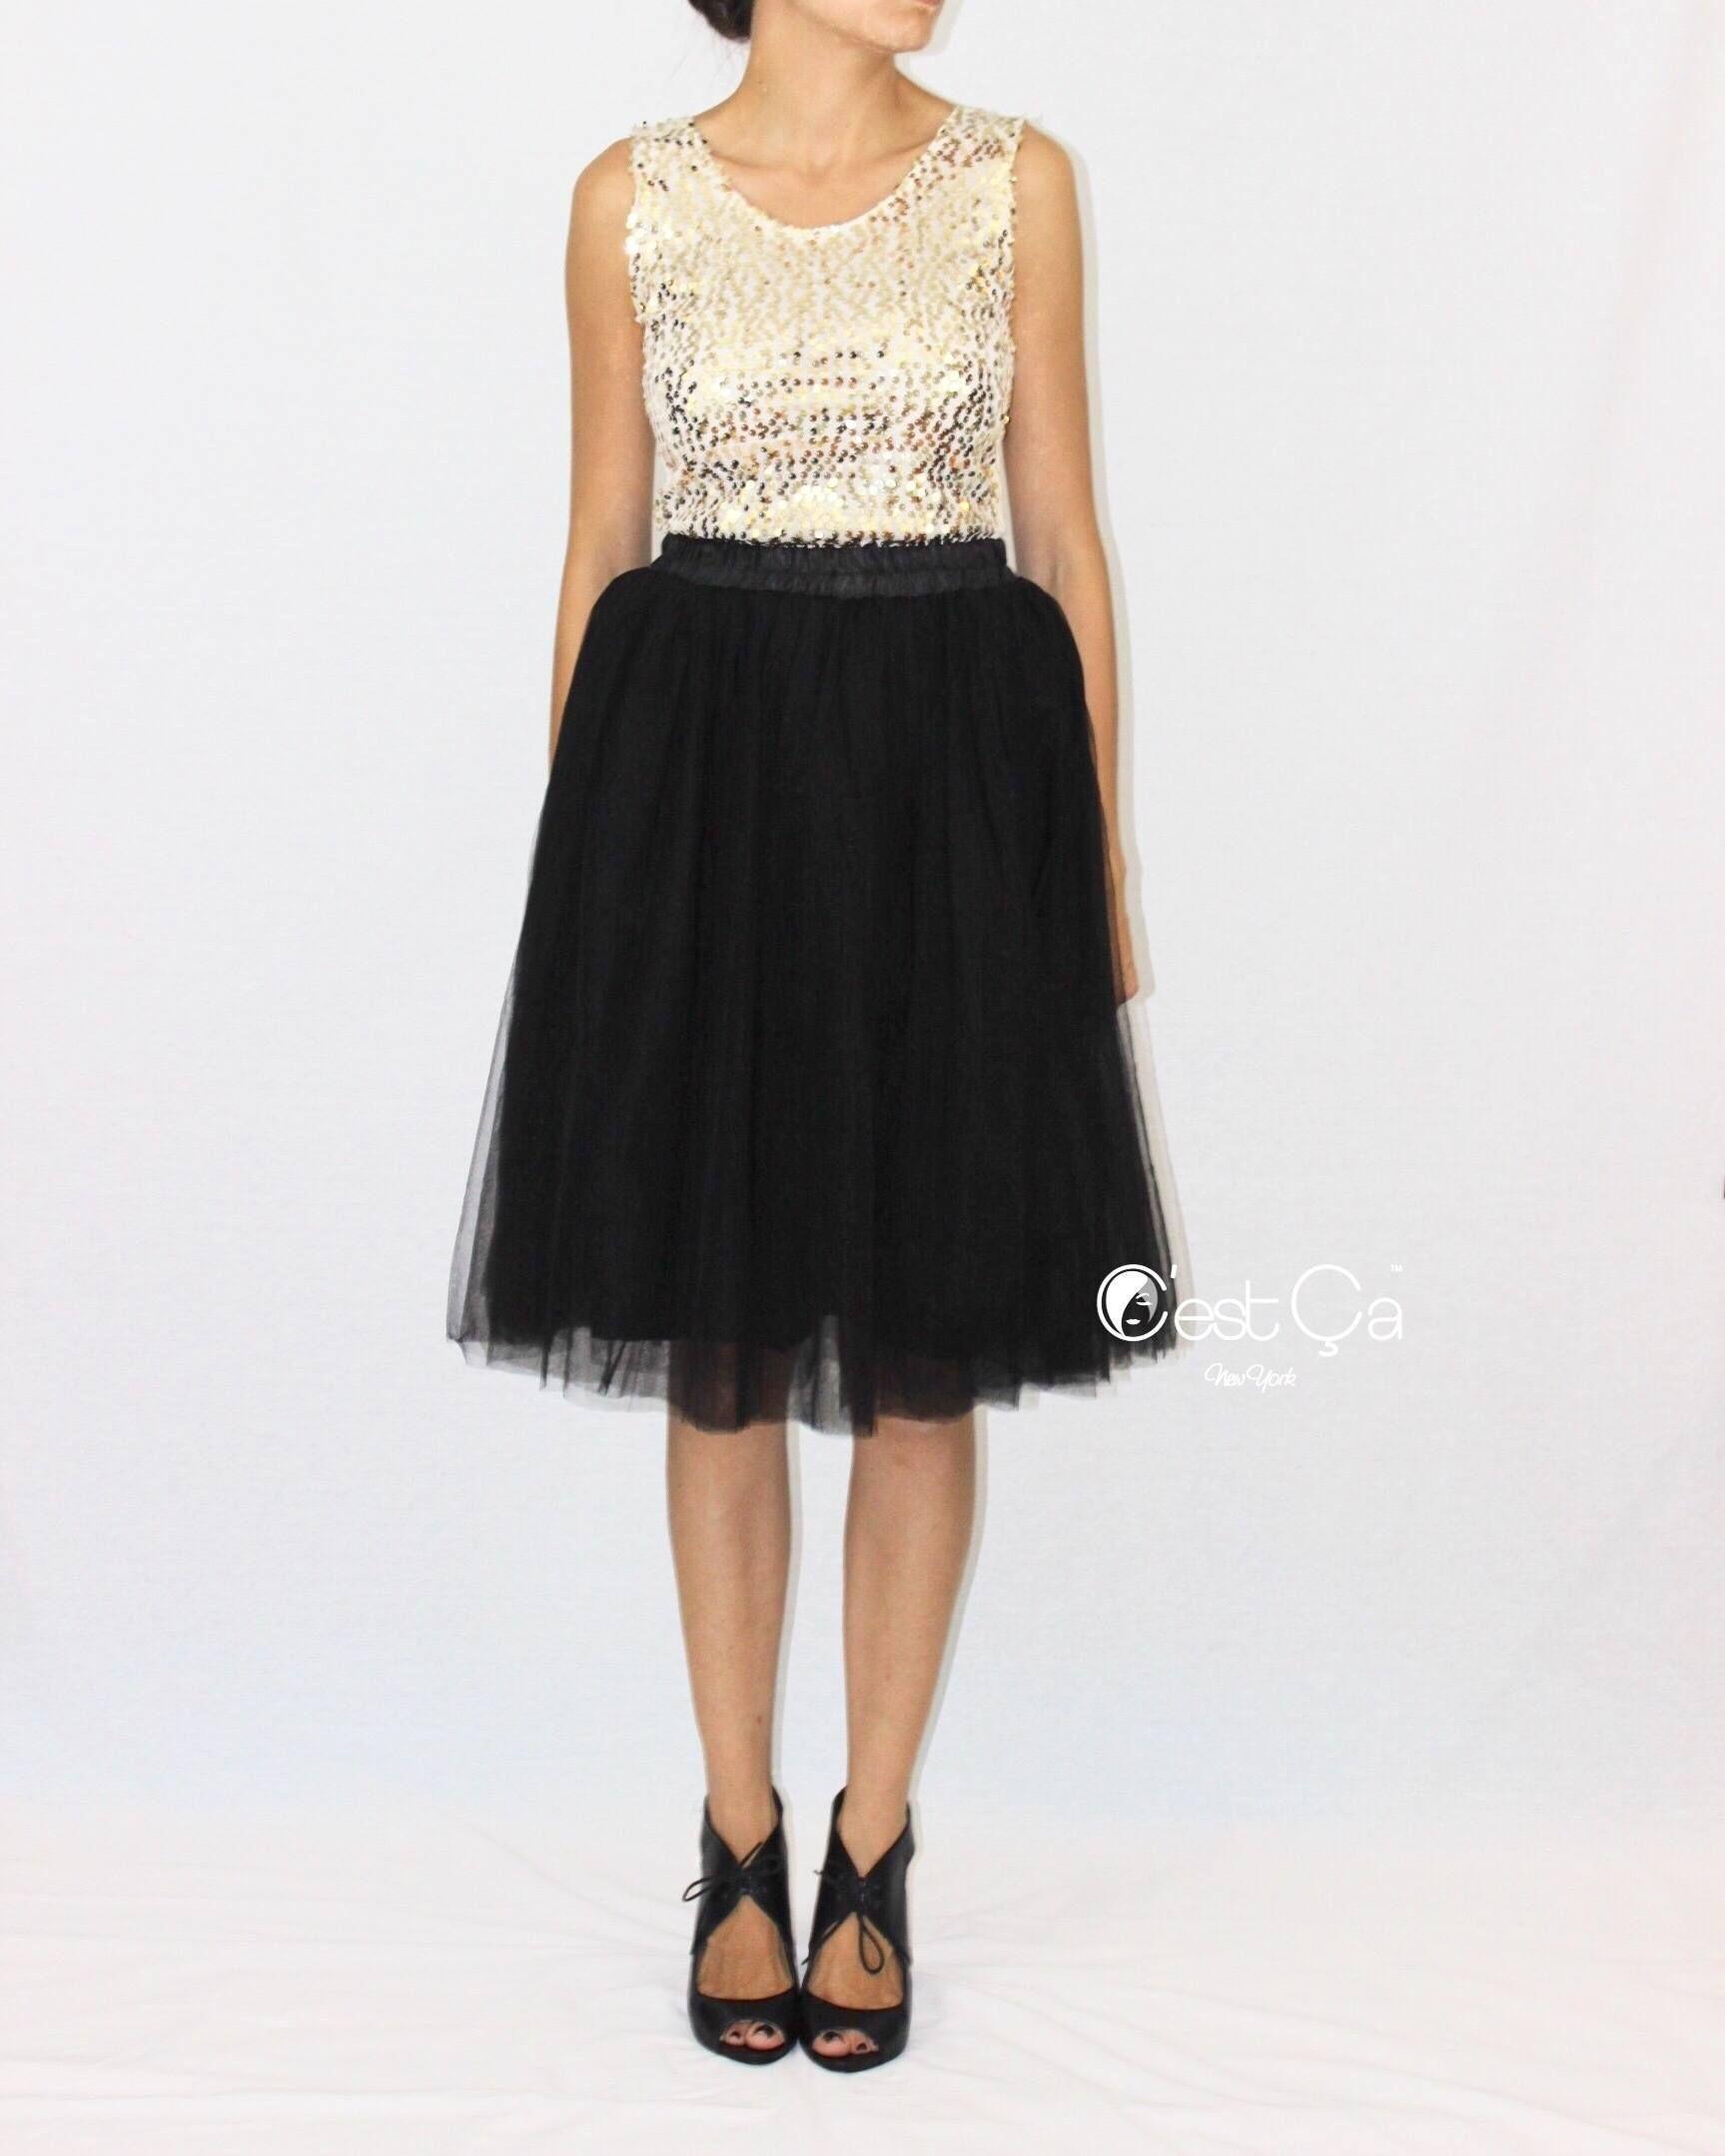 Claire Black Soft Tulle Skirt - Midi | >¤<Mod@ & €stilo >¤<